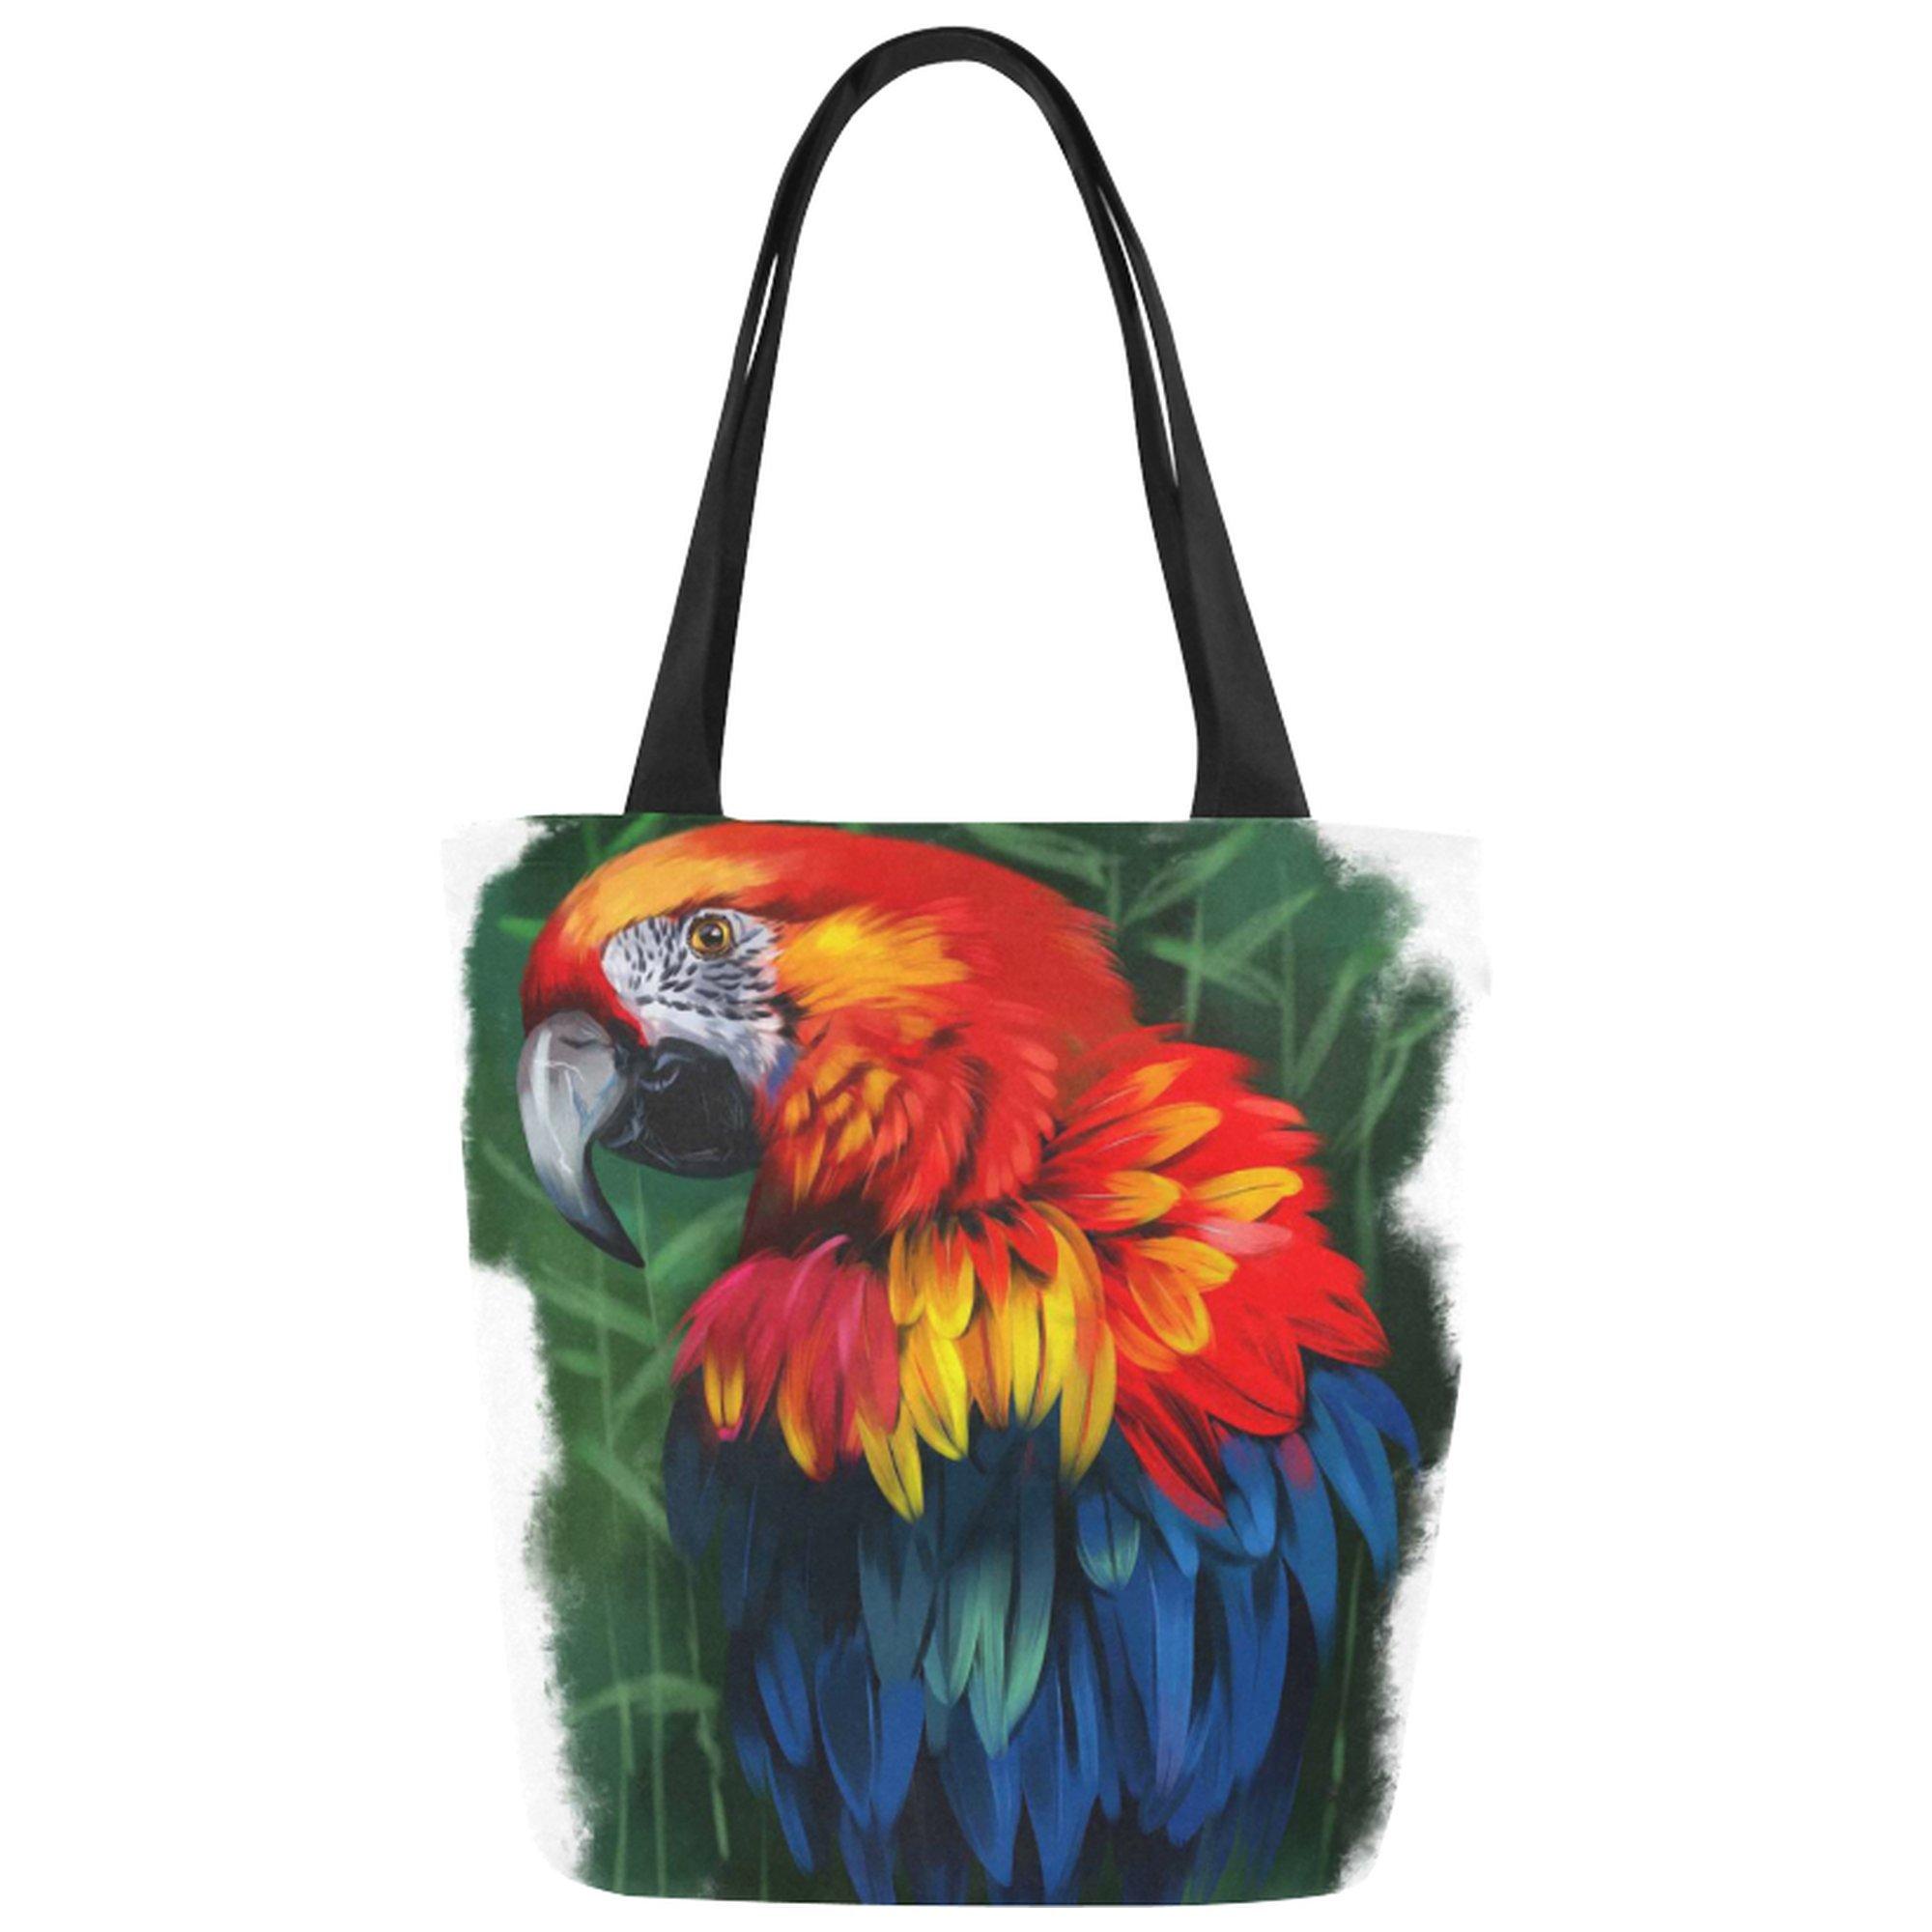 InterestPrint Animal Parrot Watercolor Painting Canvas Tote Bag Shoulder Handbag for Women Girls